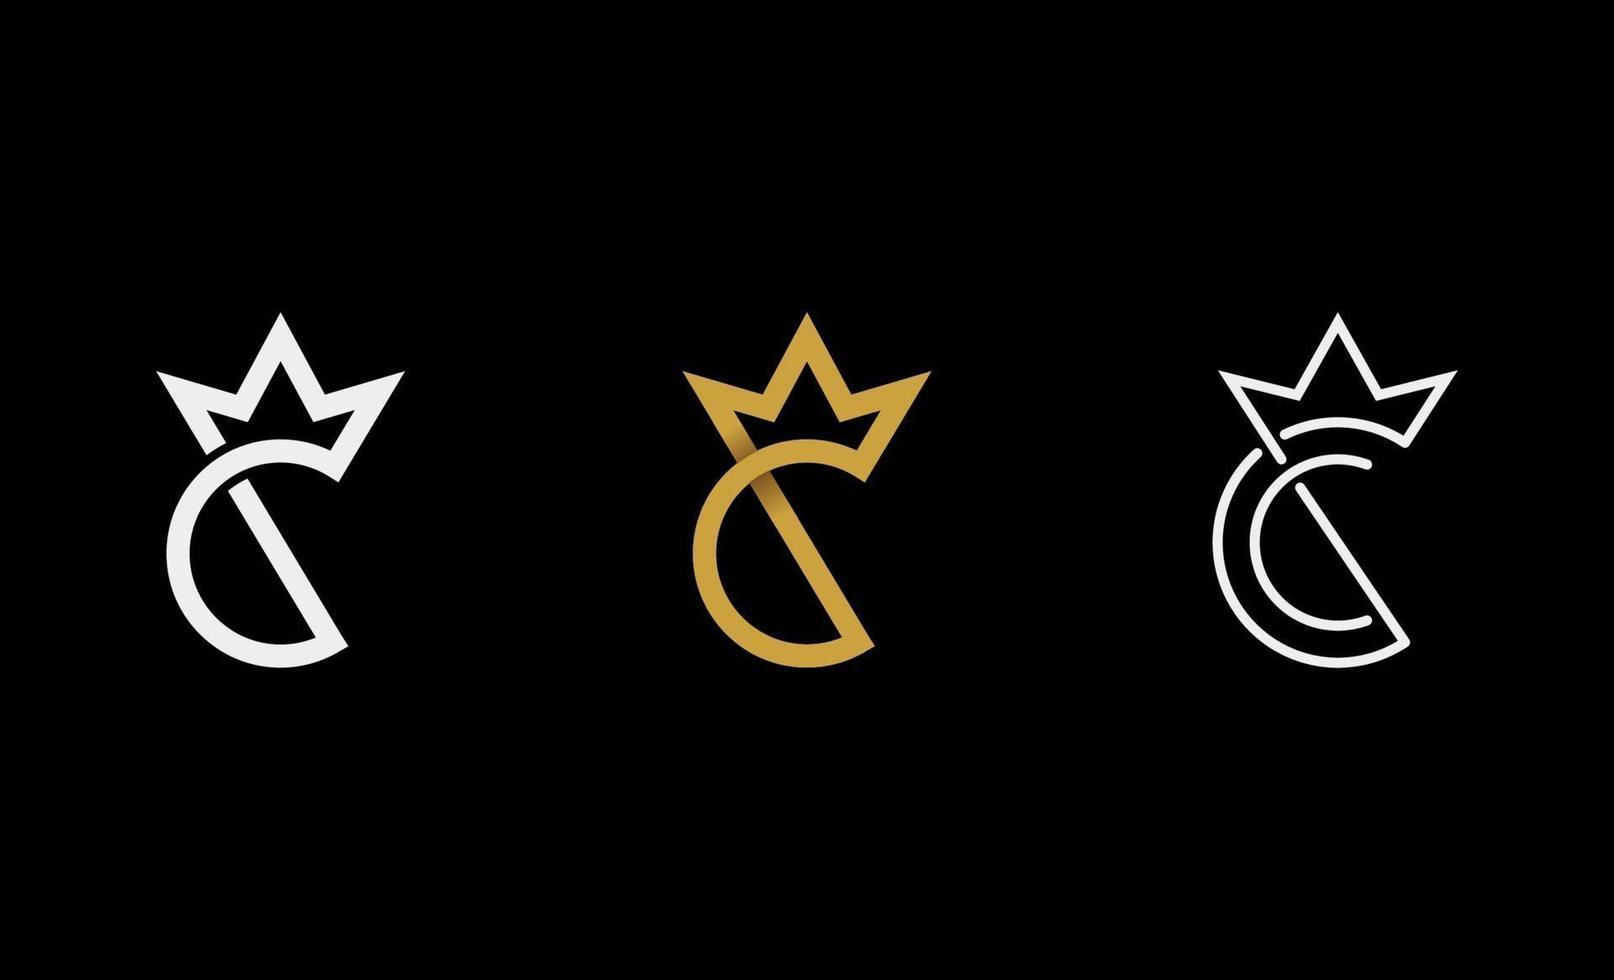 c König Royal Logo Design Vektor-Illustration vektor